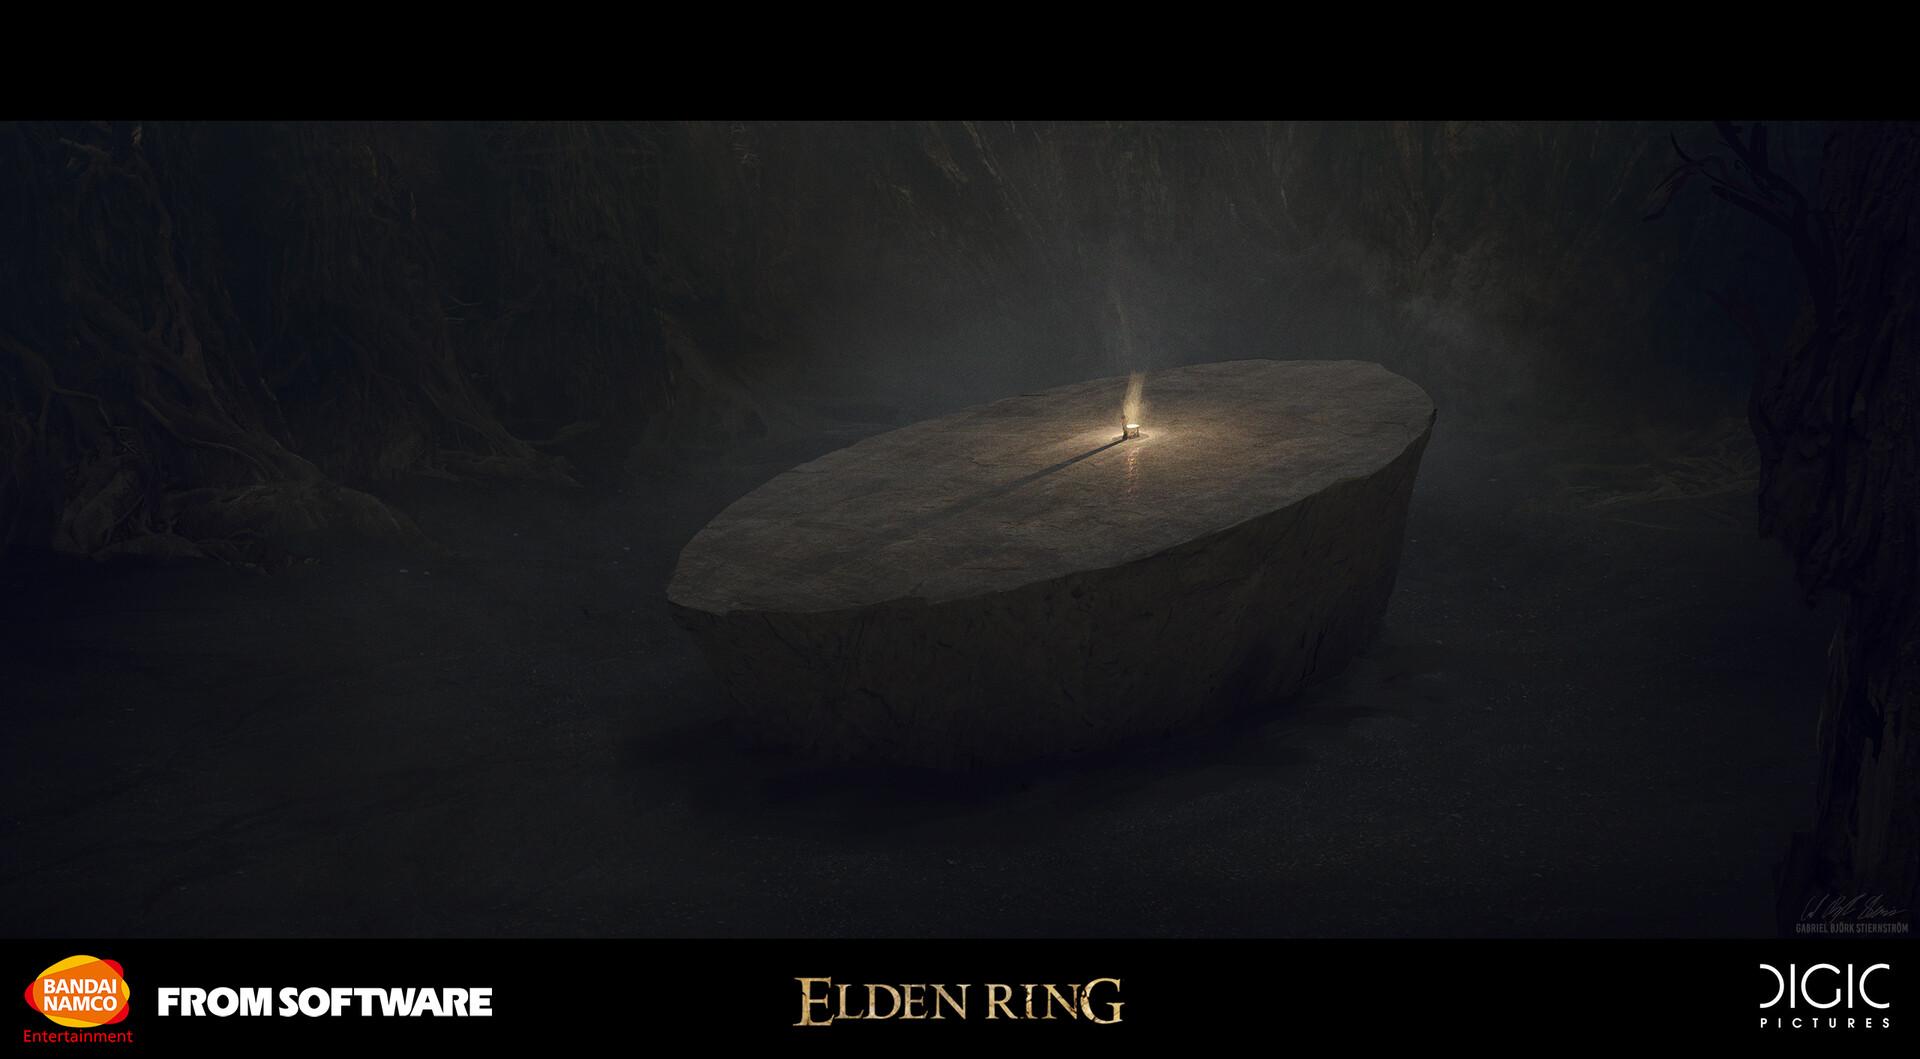 eldenring-digic-est-bigrock-high